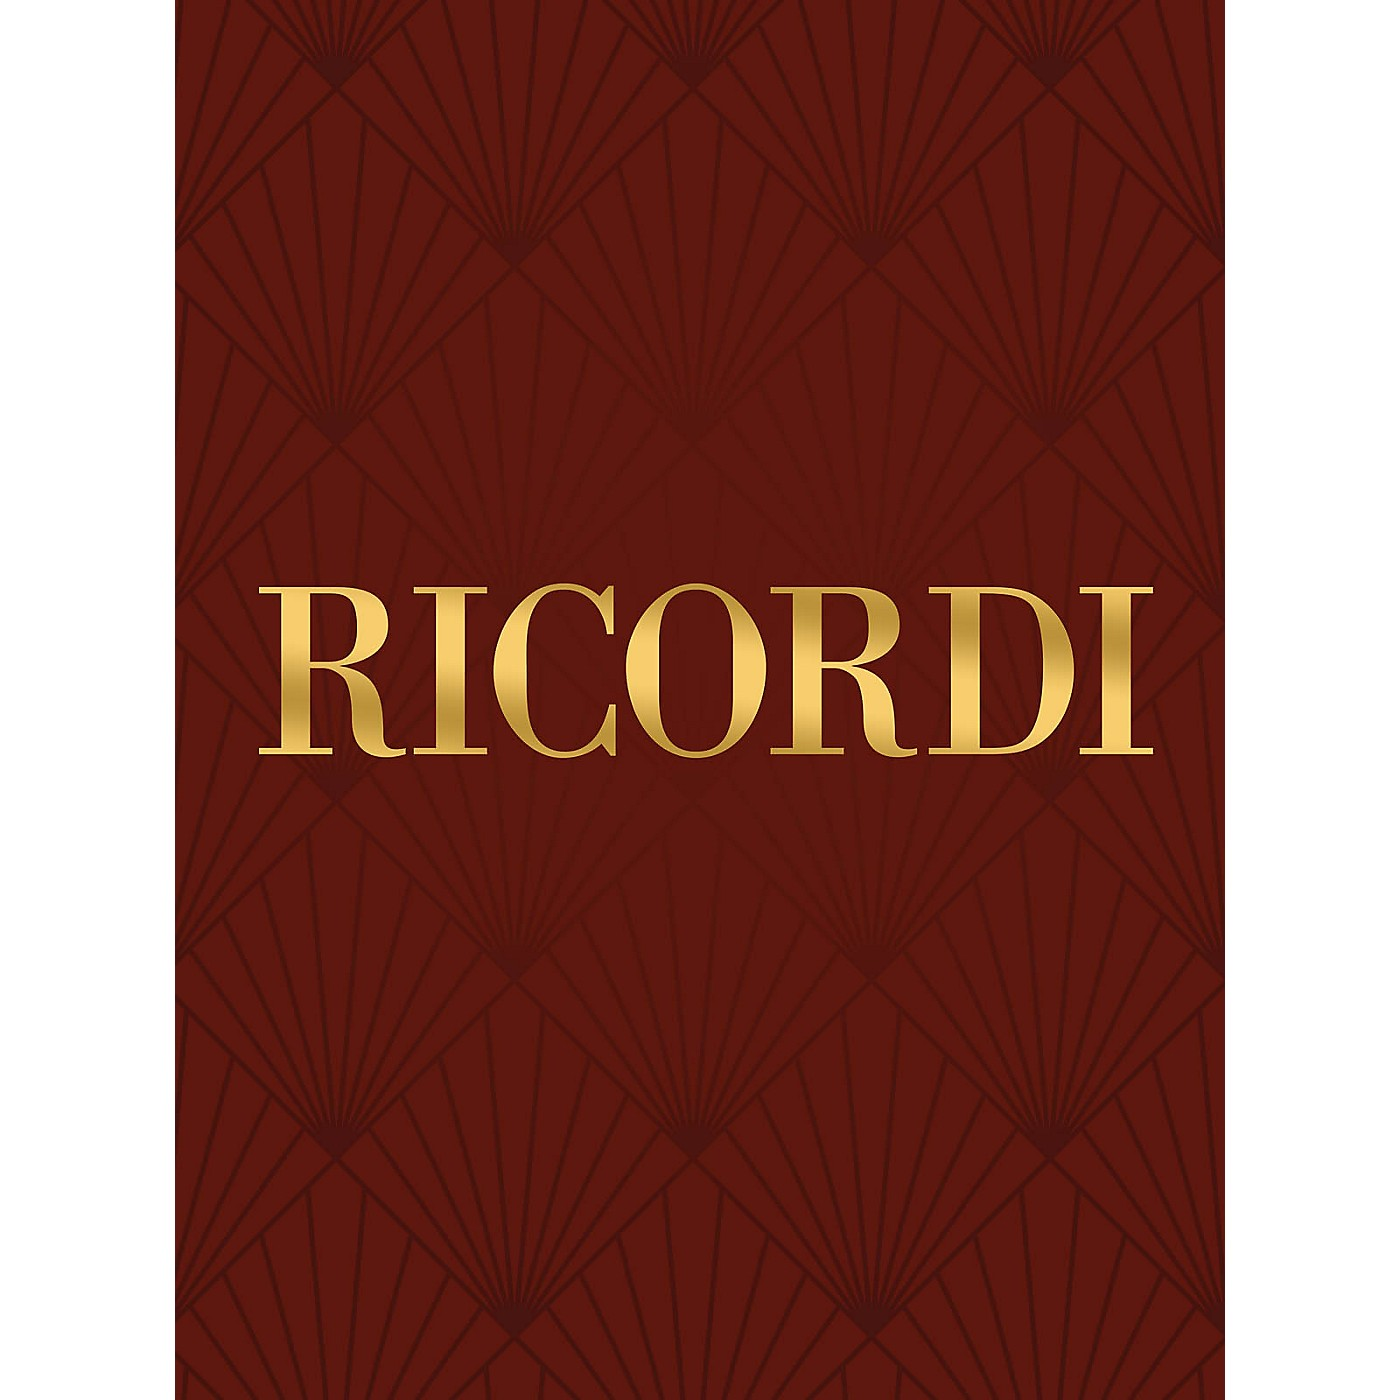 Ricordi Sonatas Vol. 2 (Nos. 17-32) Piano Collection Composed by Ludwig van Beethoven Edited by Alfredo Casella thumbnail